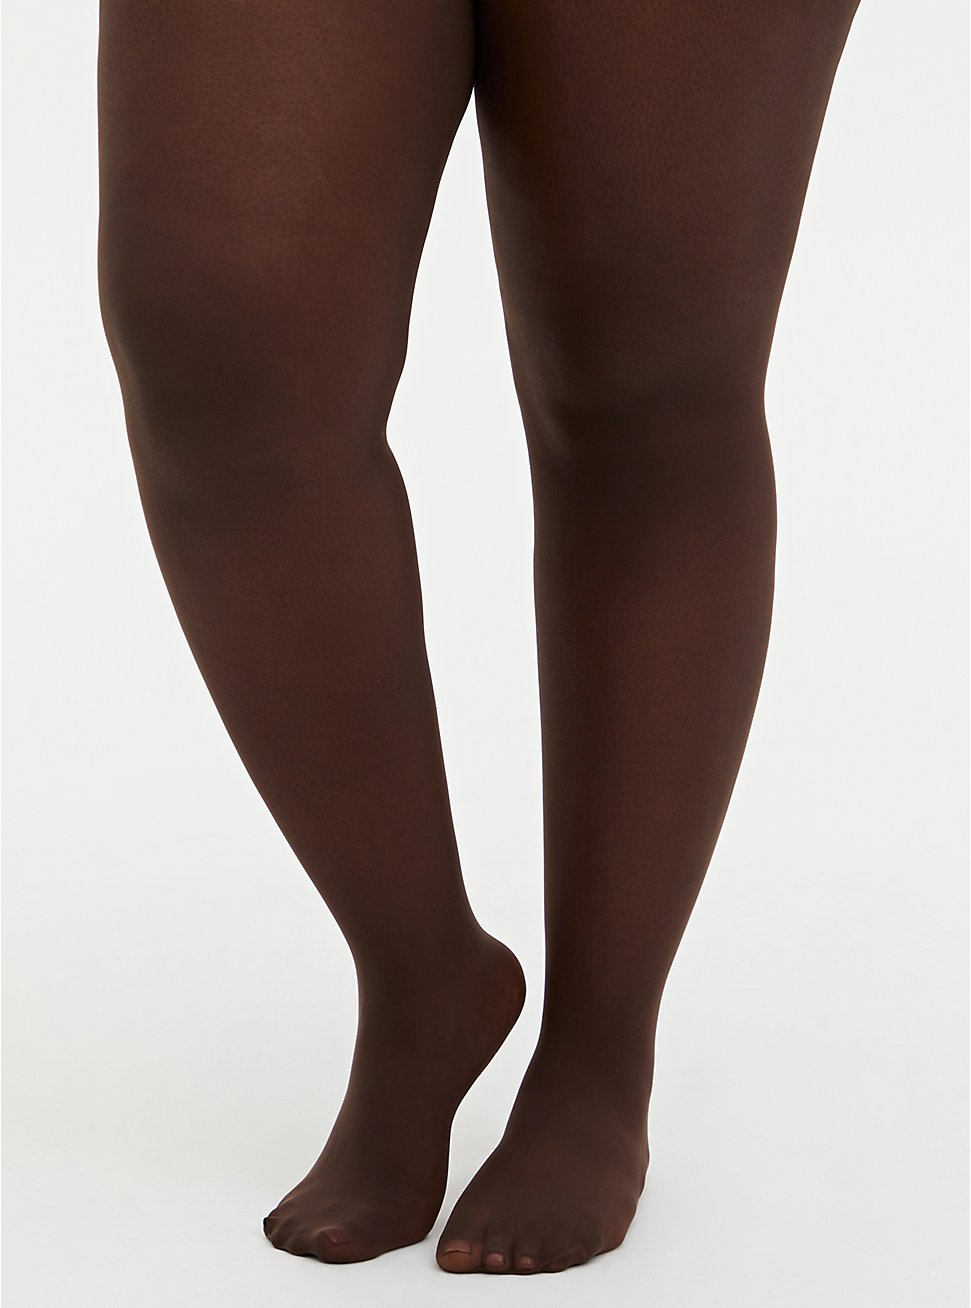 Plus Size  Sheer Chocolate Brown Tights, BROWN, hi-res